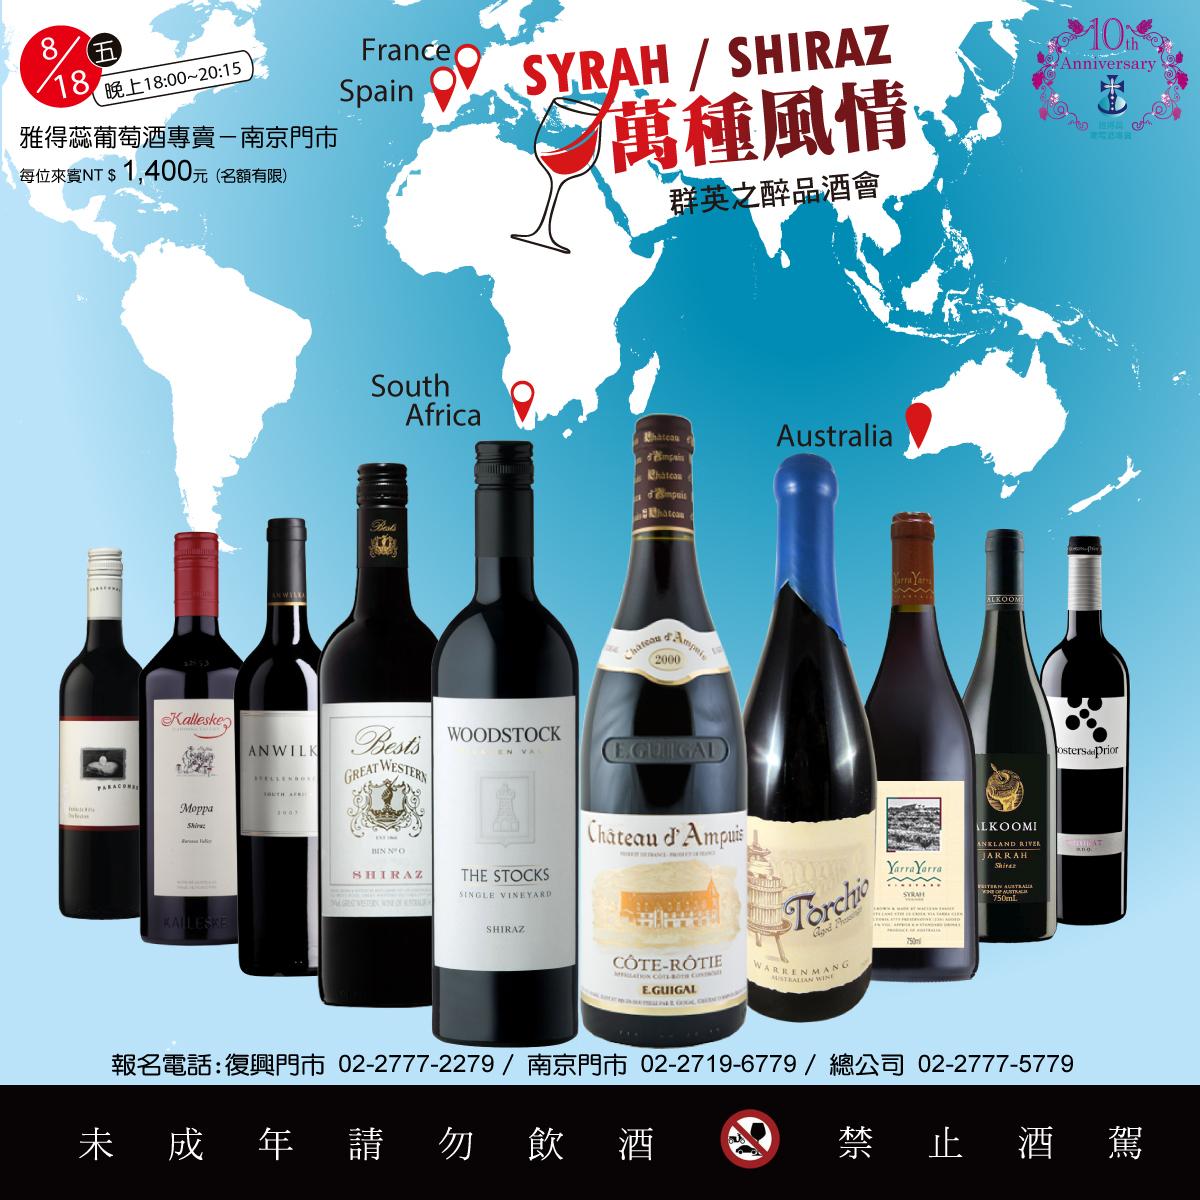 20170818-fb廣告_希哈品酒會.jpg